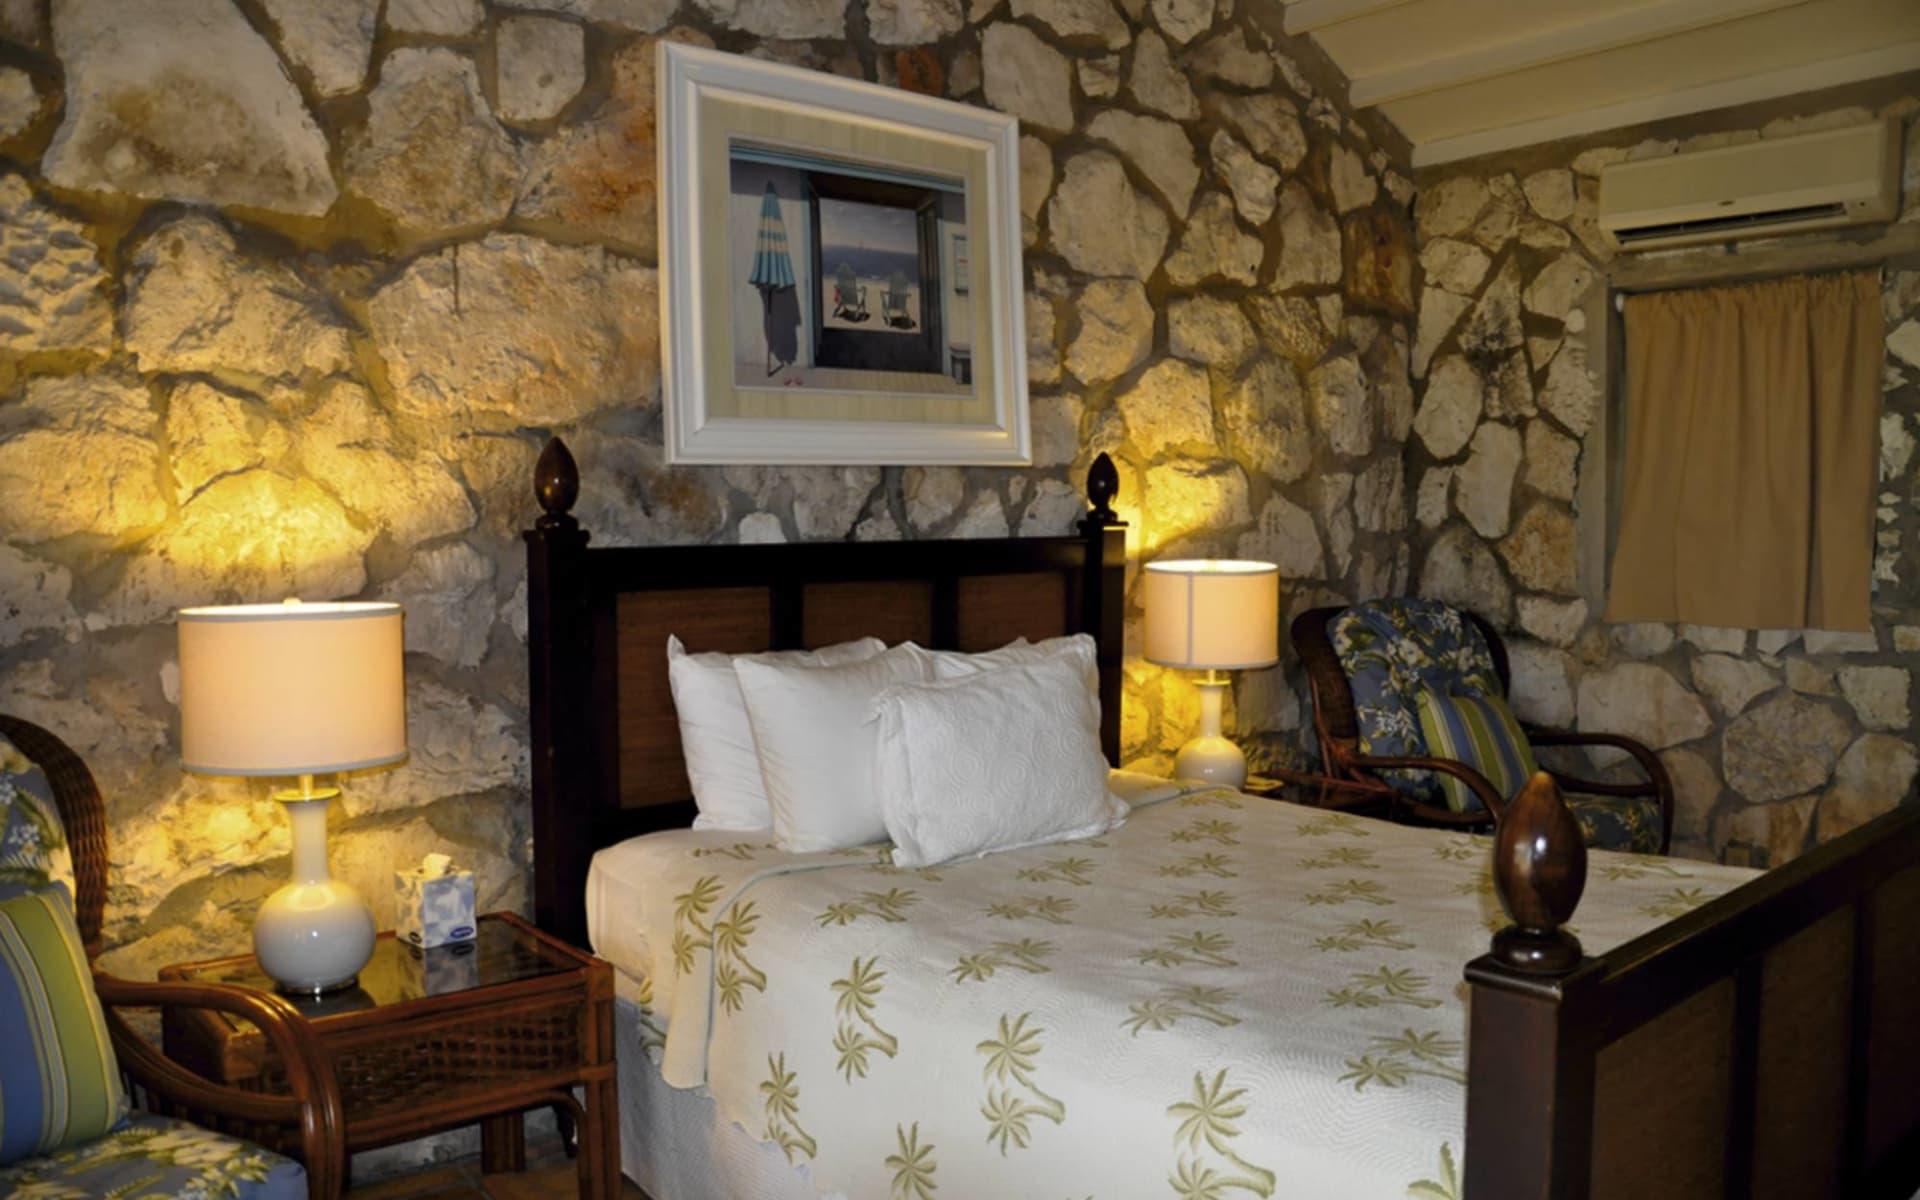 Fernandez Bay Village in New Bight: zimmer fernandez bay village doppelzimmer